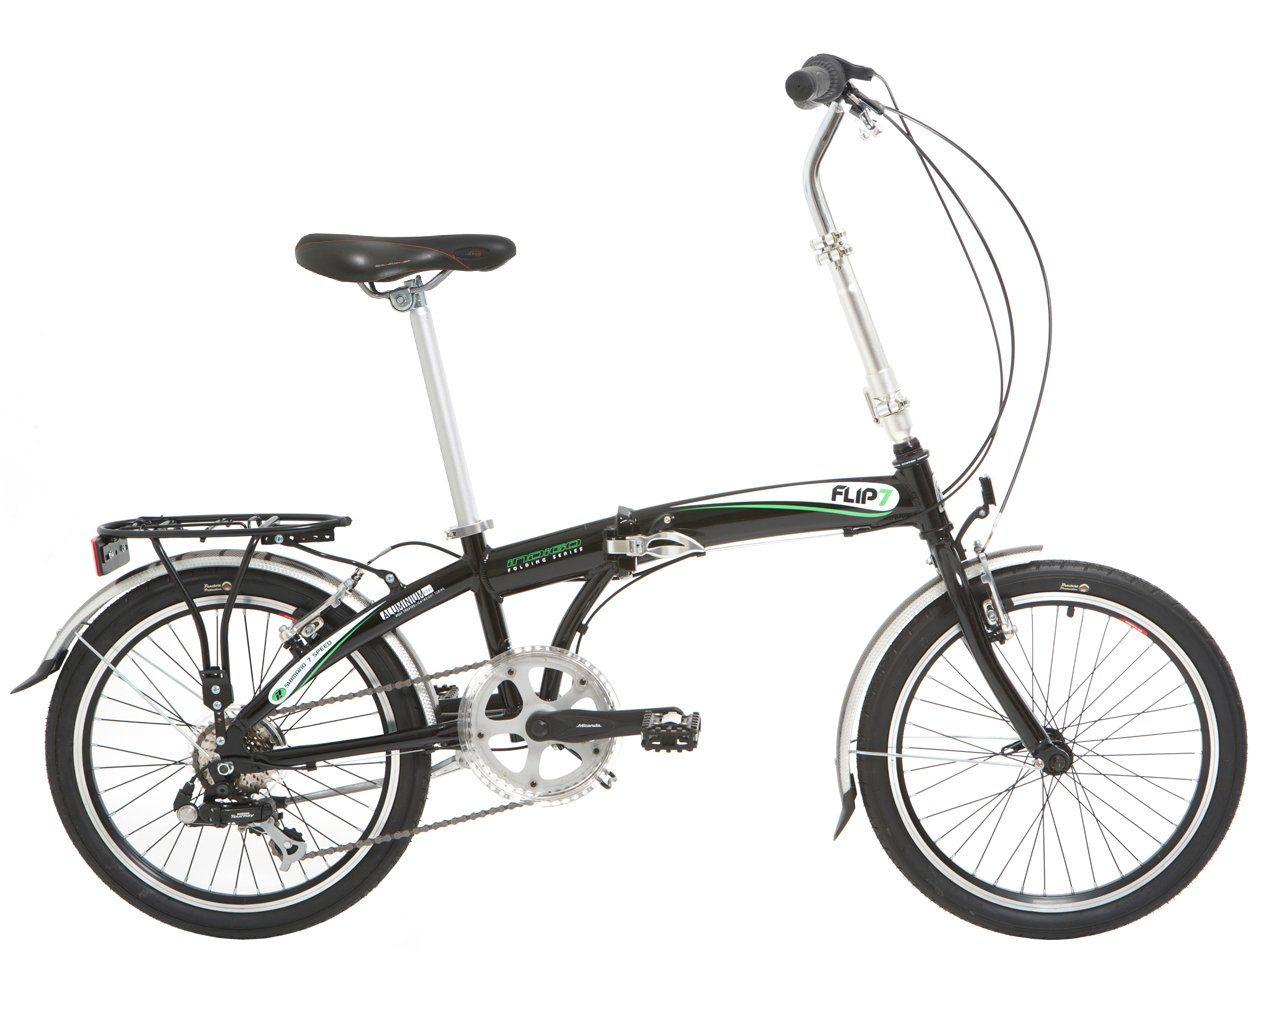 Bici Pieghevole Bfold 7.Indigo Flip 7 Bicicleta Plegables Rueda 20 In Color Negro